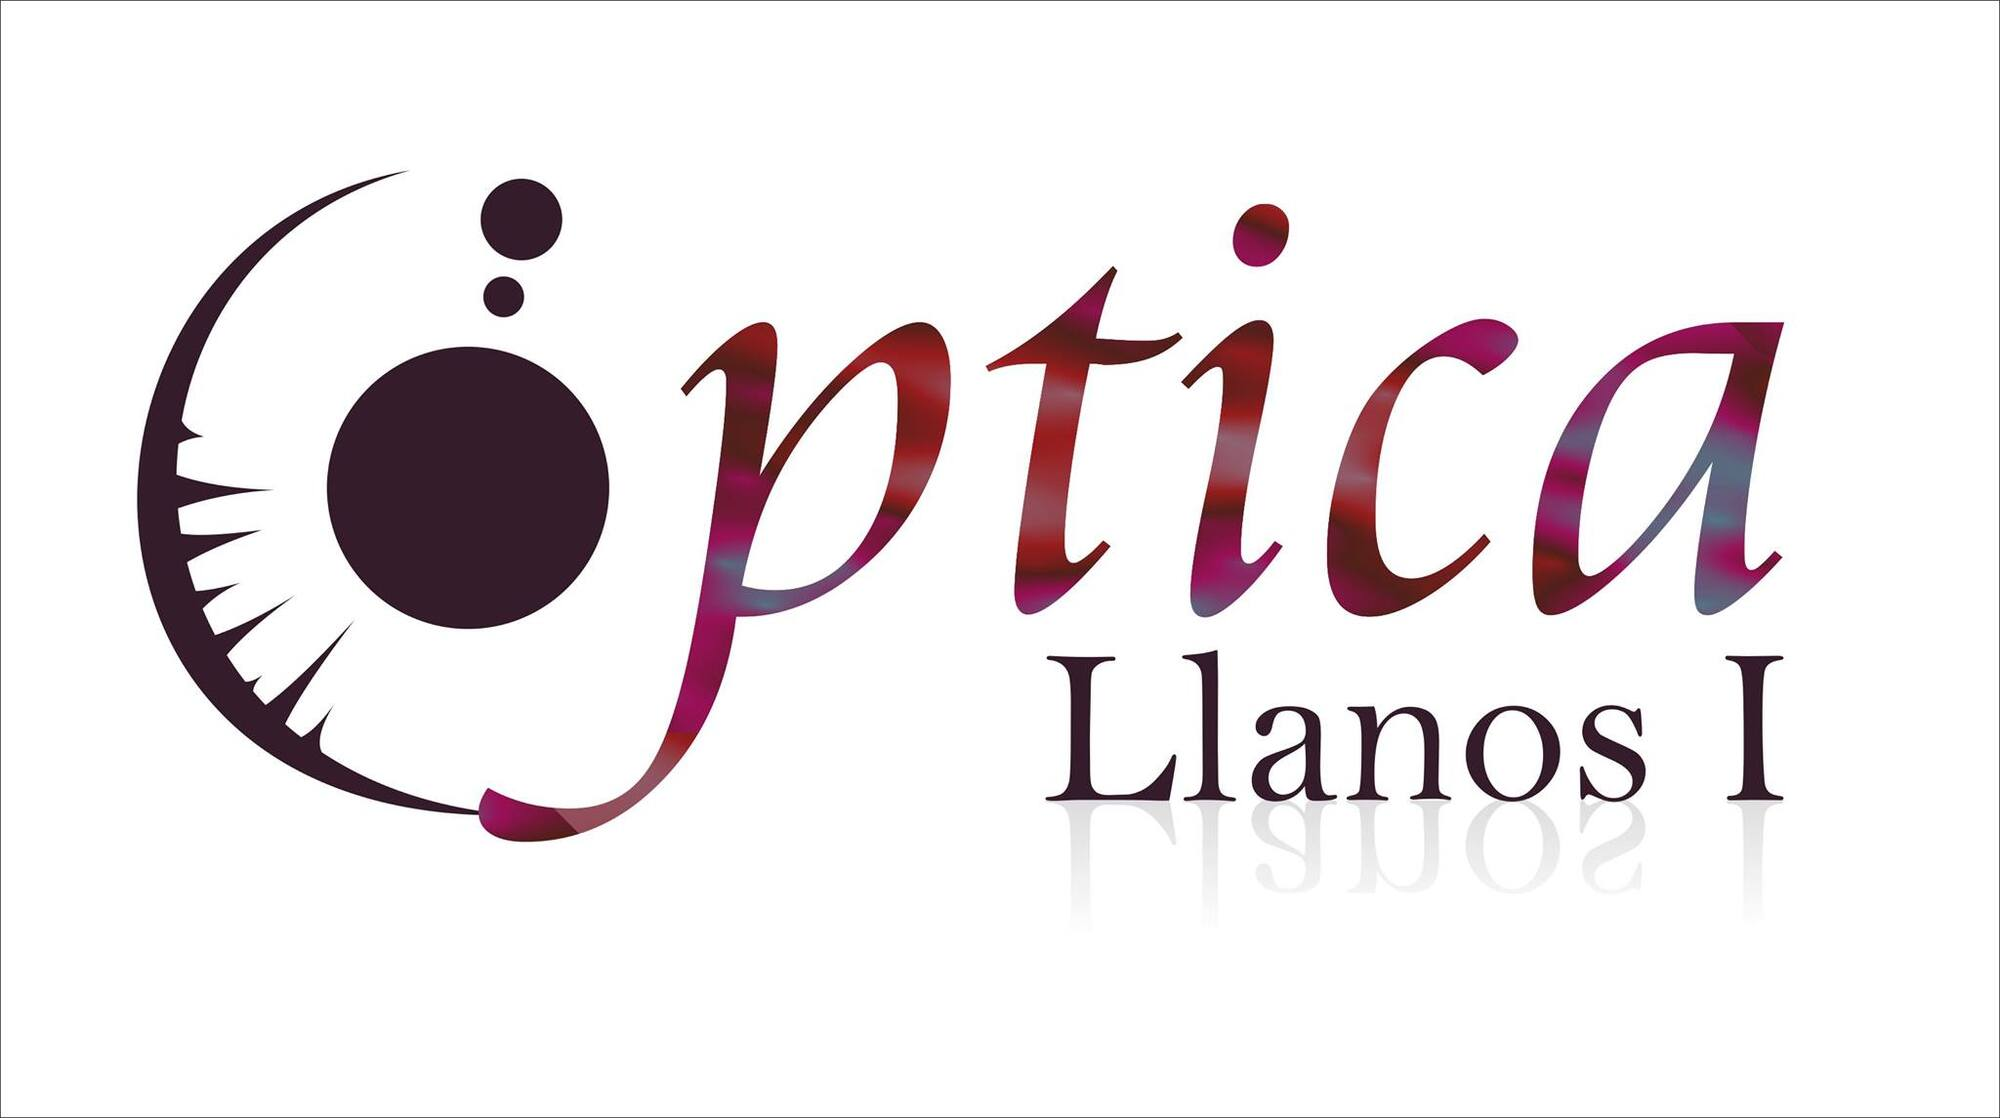 Óptica Llanos 1